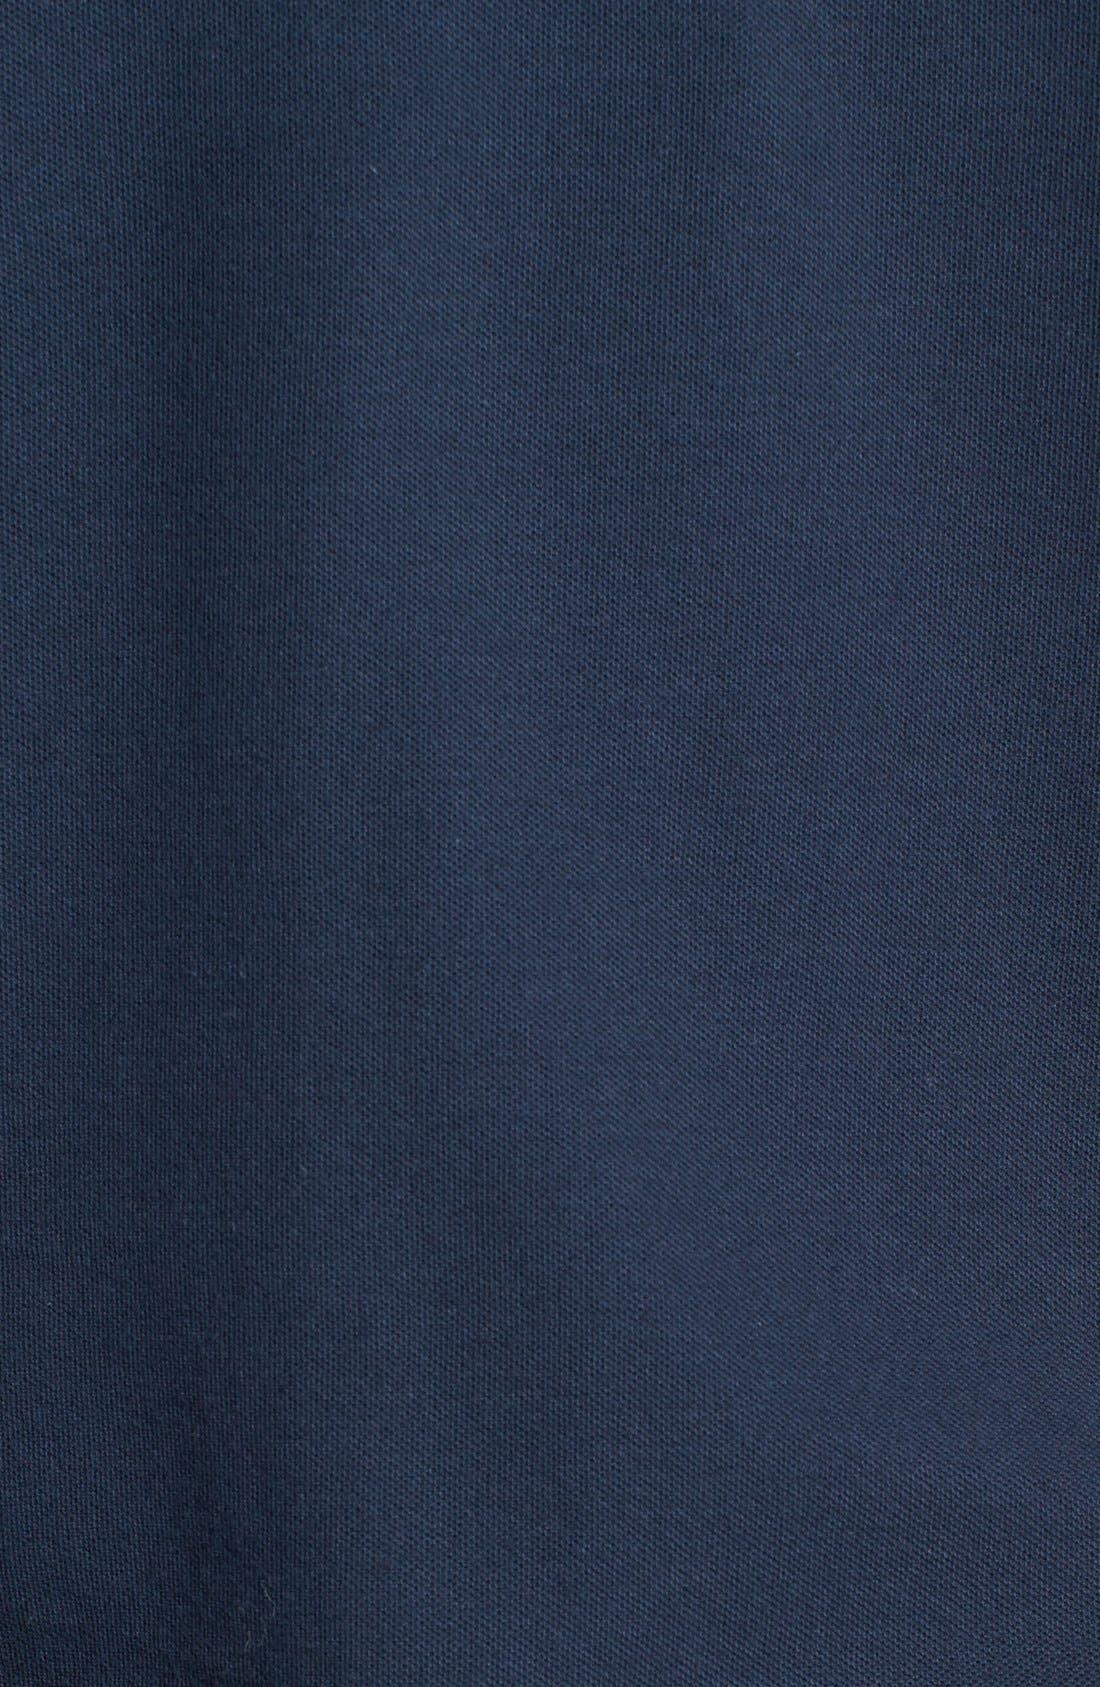 Alternate Image 3  - Original Penguin Piqué Polo